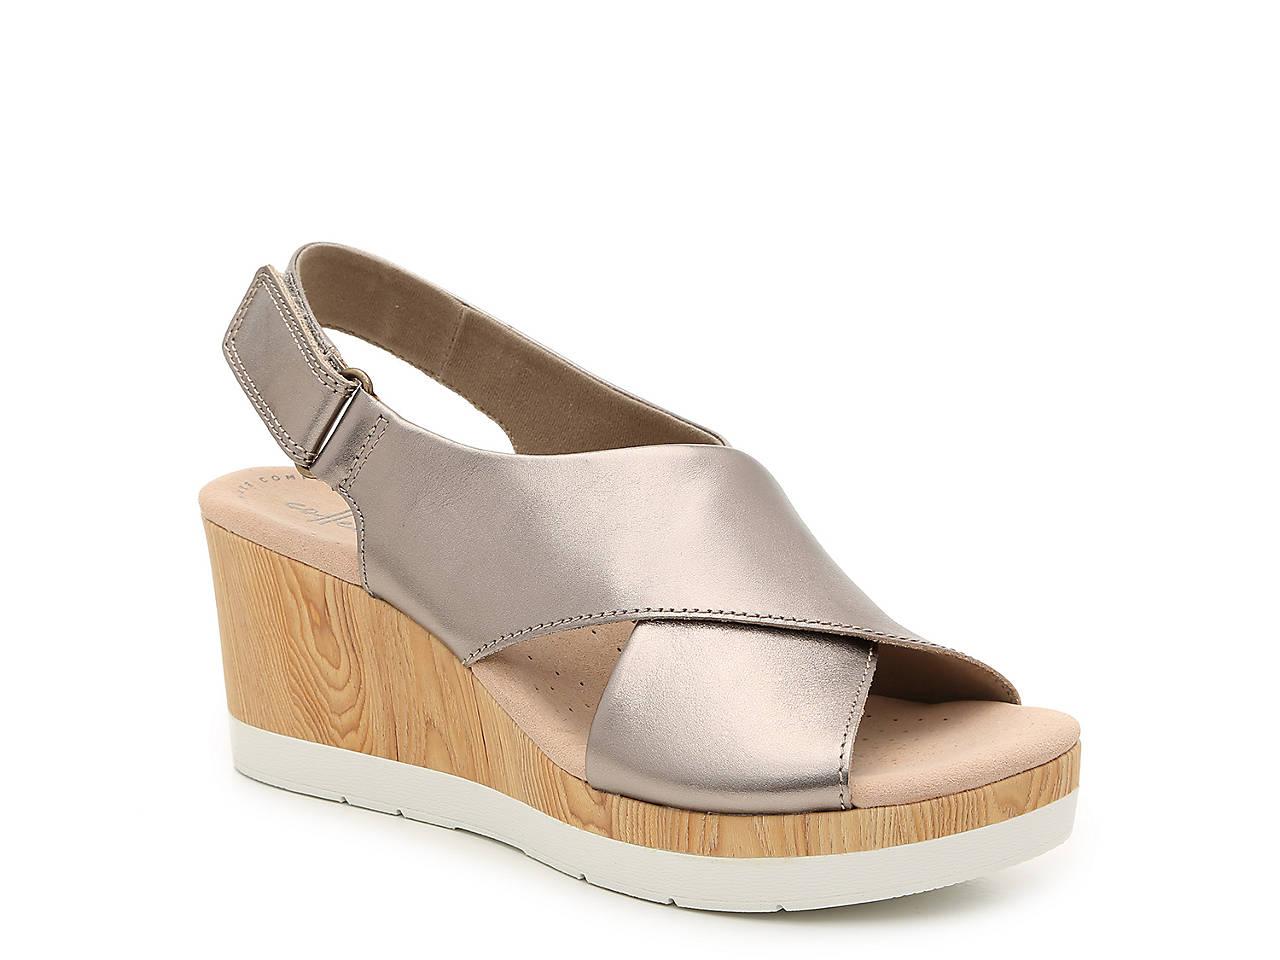 e8297871d Clarks Cammy Pearl Wedge Sandal Women's Shoes | DSW